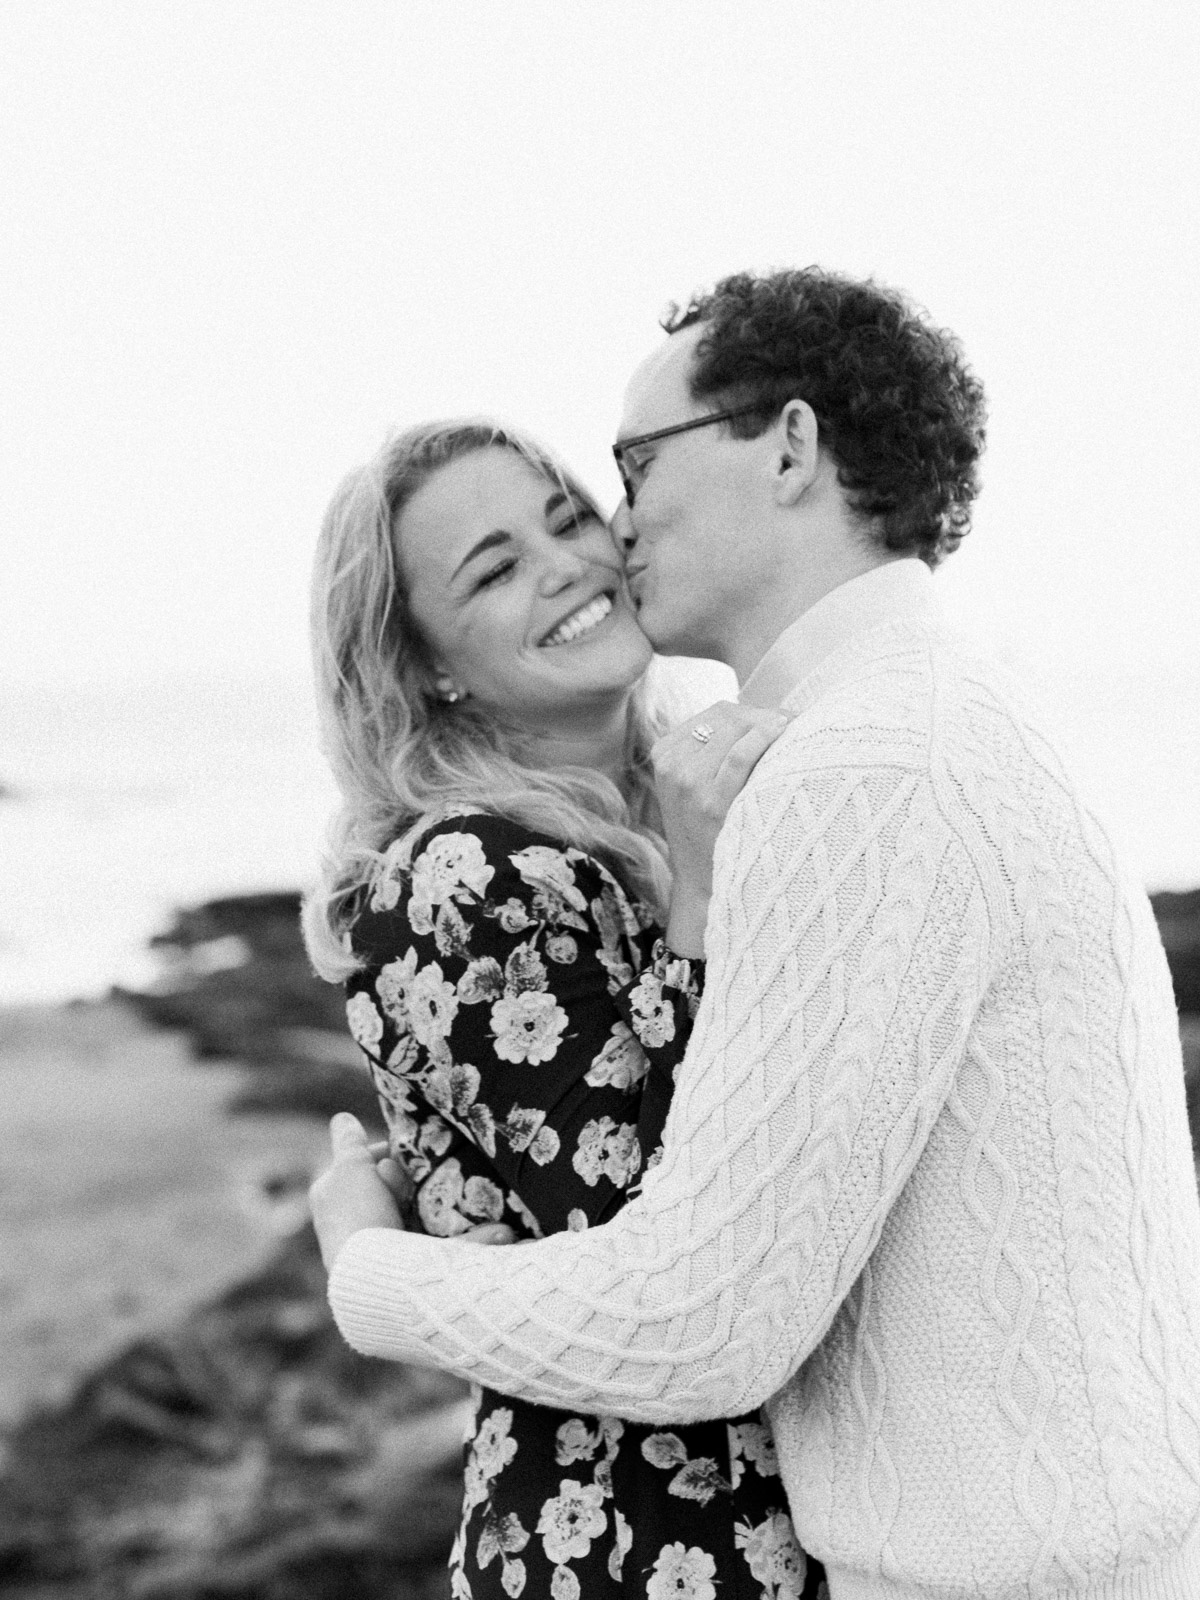 Romantic & Joyful Engagement Photos at Lighthouse Point Park-12.jpg